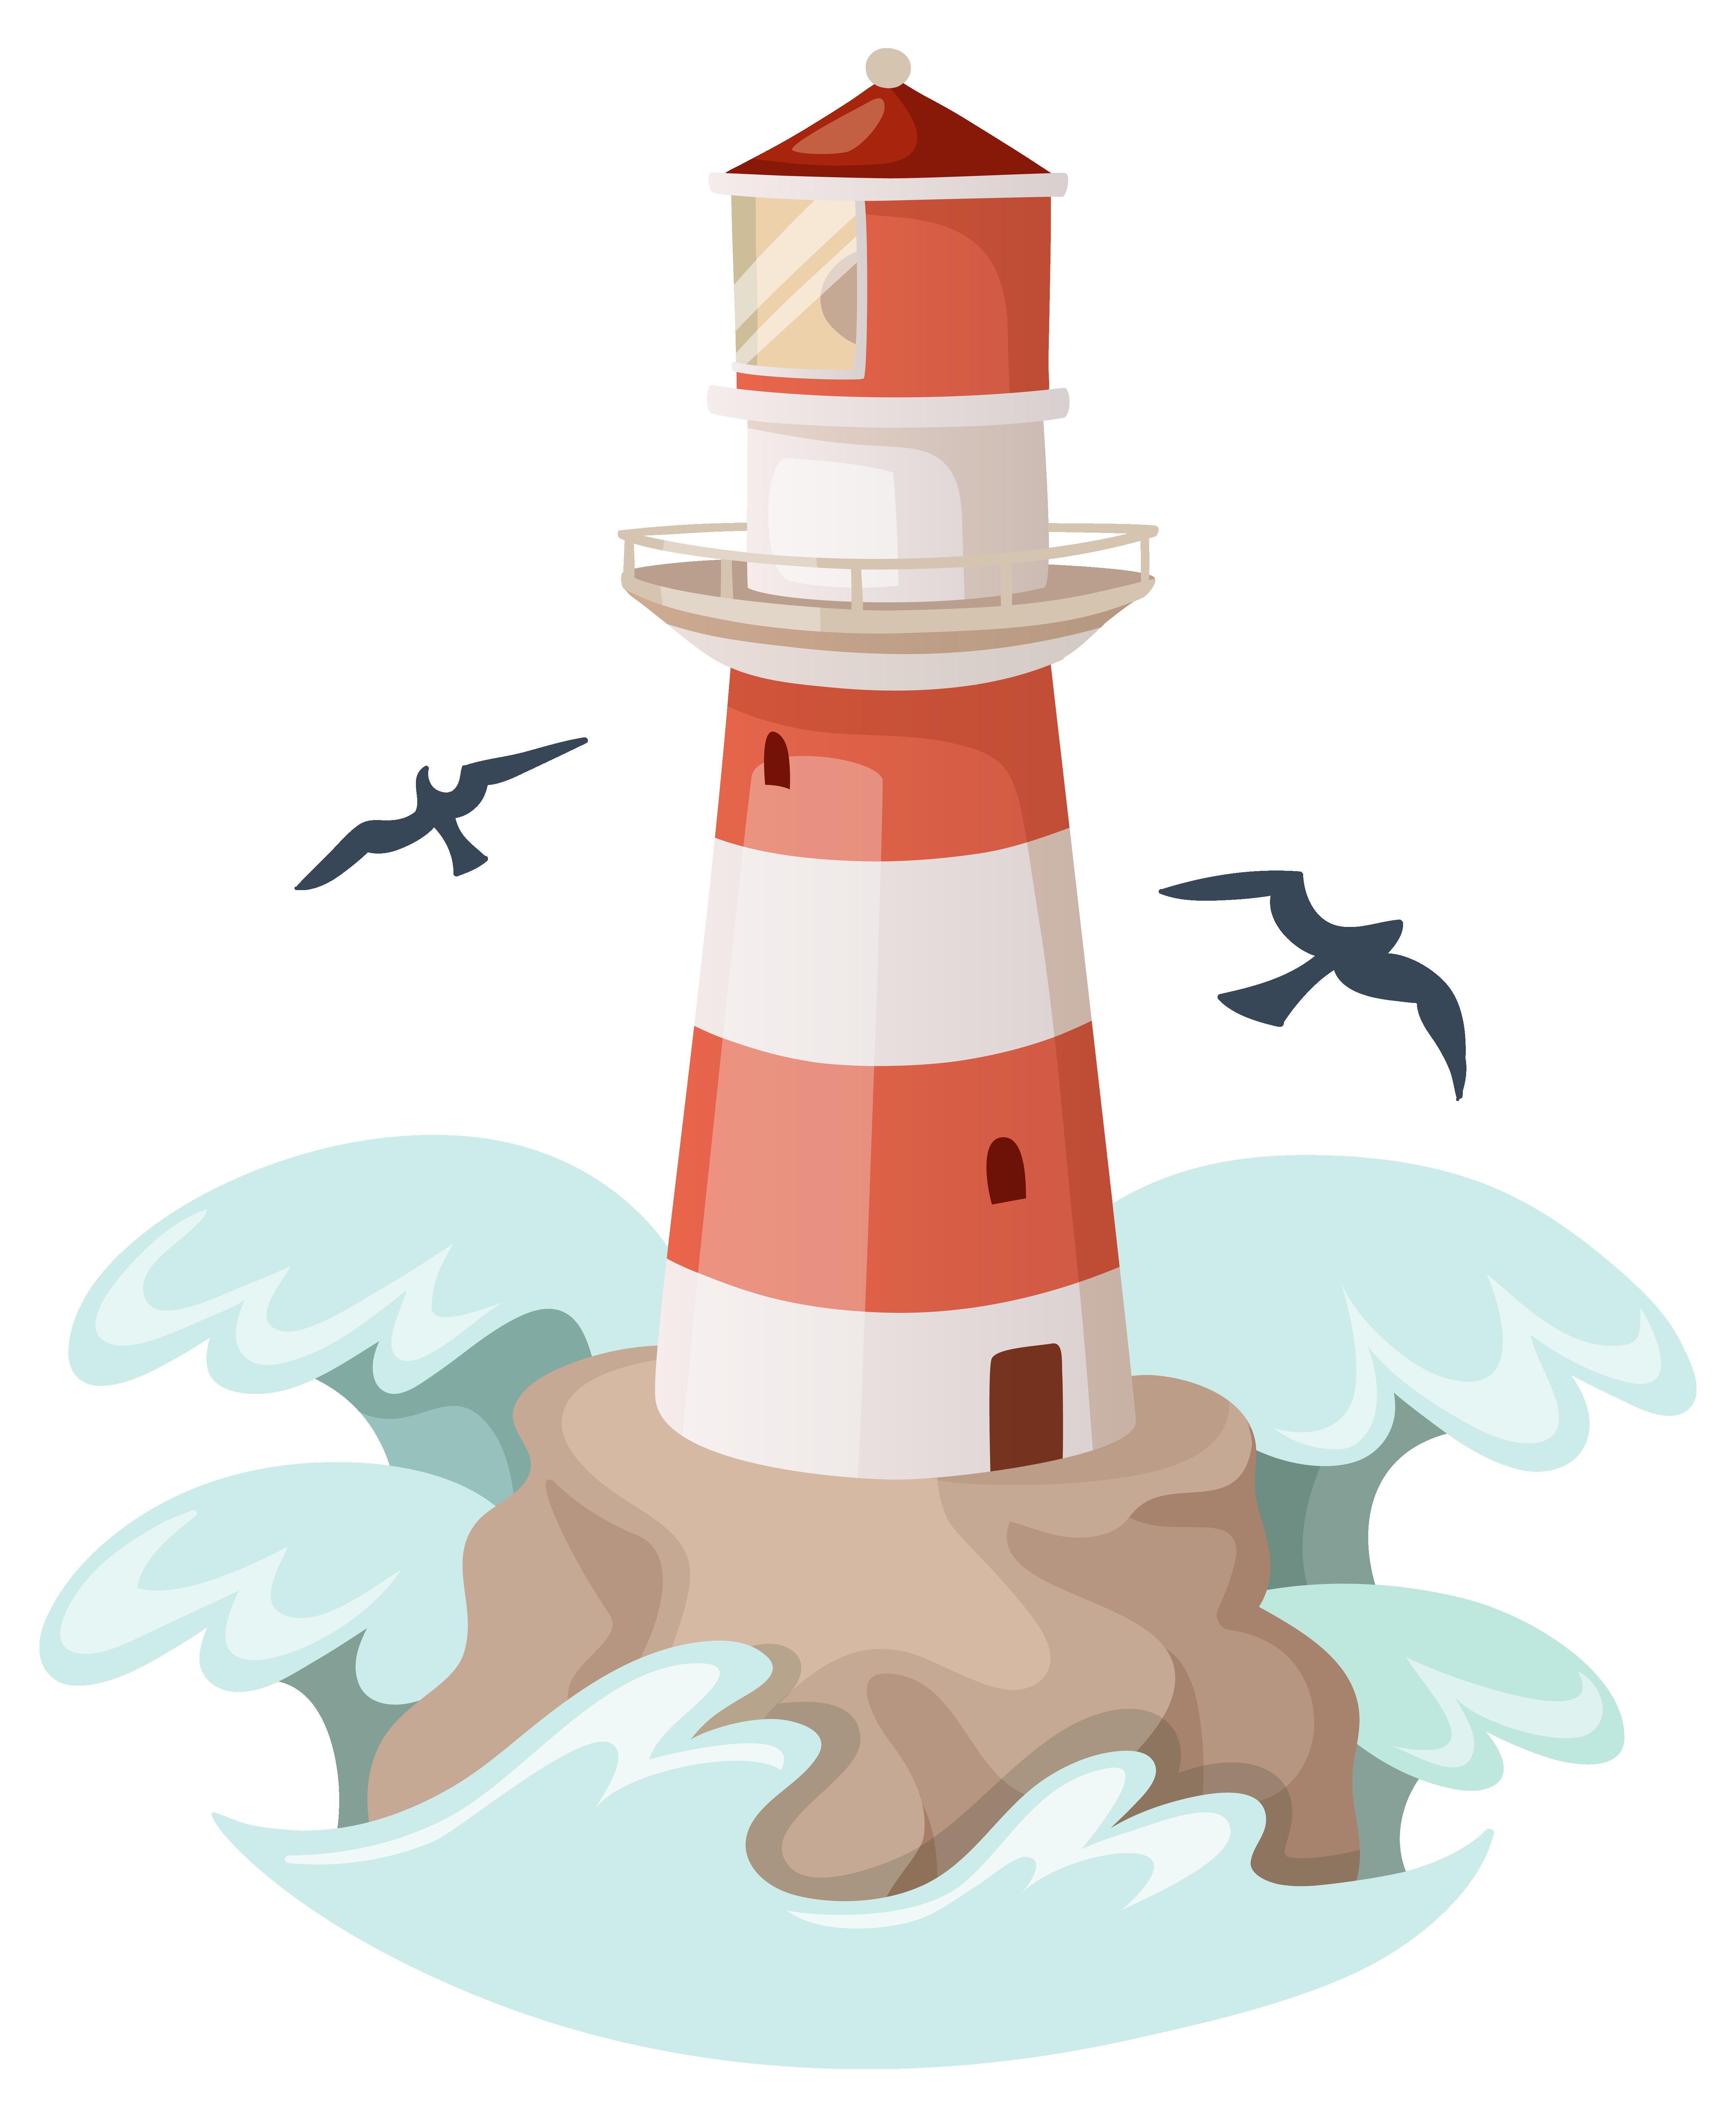 Lighthouse clipart image-Lighthouse clipart image-13